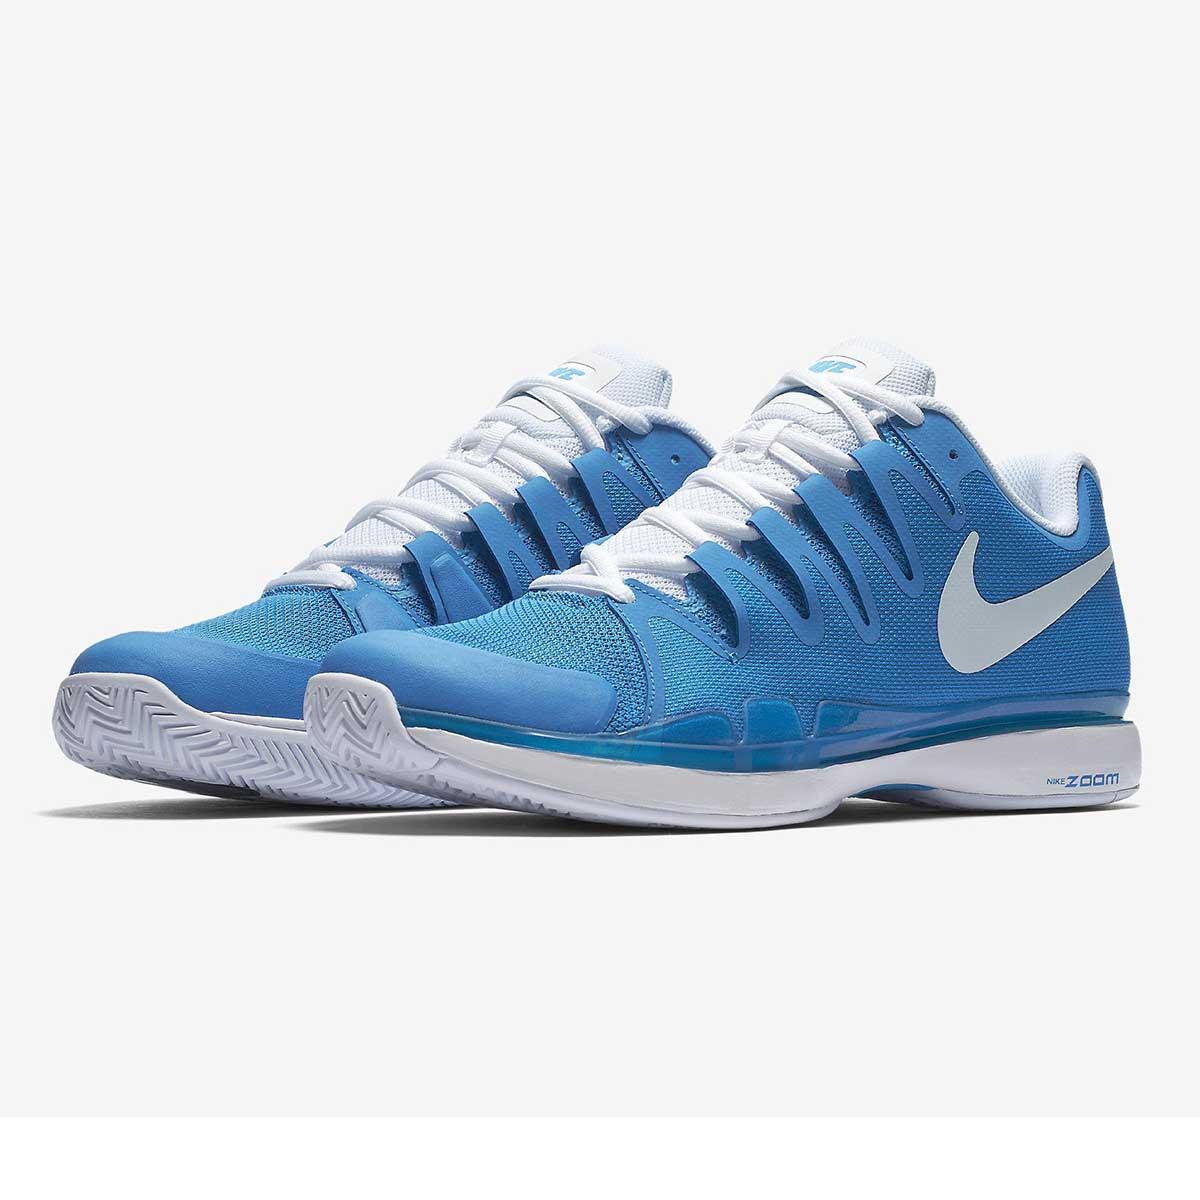 cf25dd9e5869 Buy Nike Zoom Vapor 9.5 Tour Tennis Shoes Online India